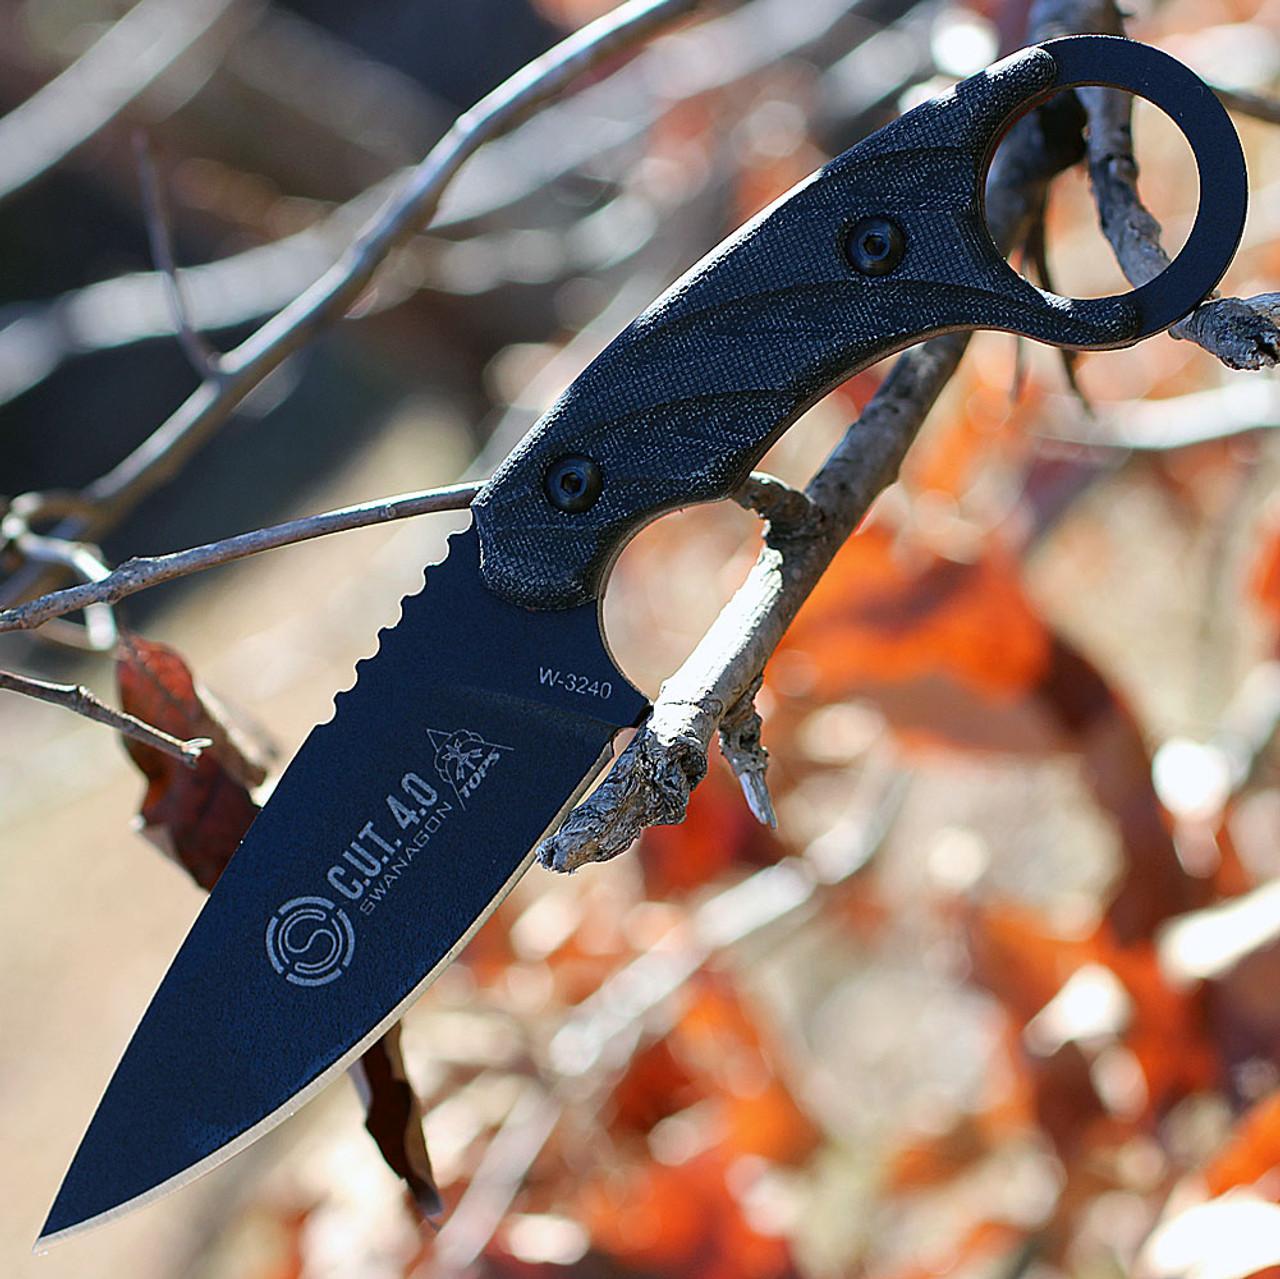 Tops Knives CUT-40 Combat Utility Tool Blackout Edition, Joshua Swanagon Karambit Style Fixed Blade